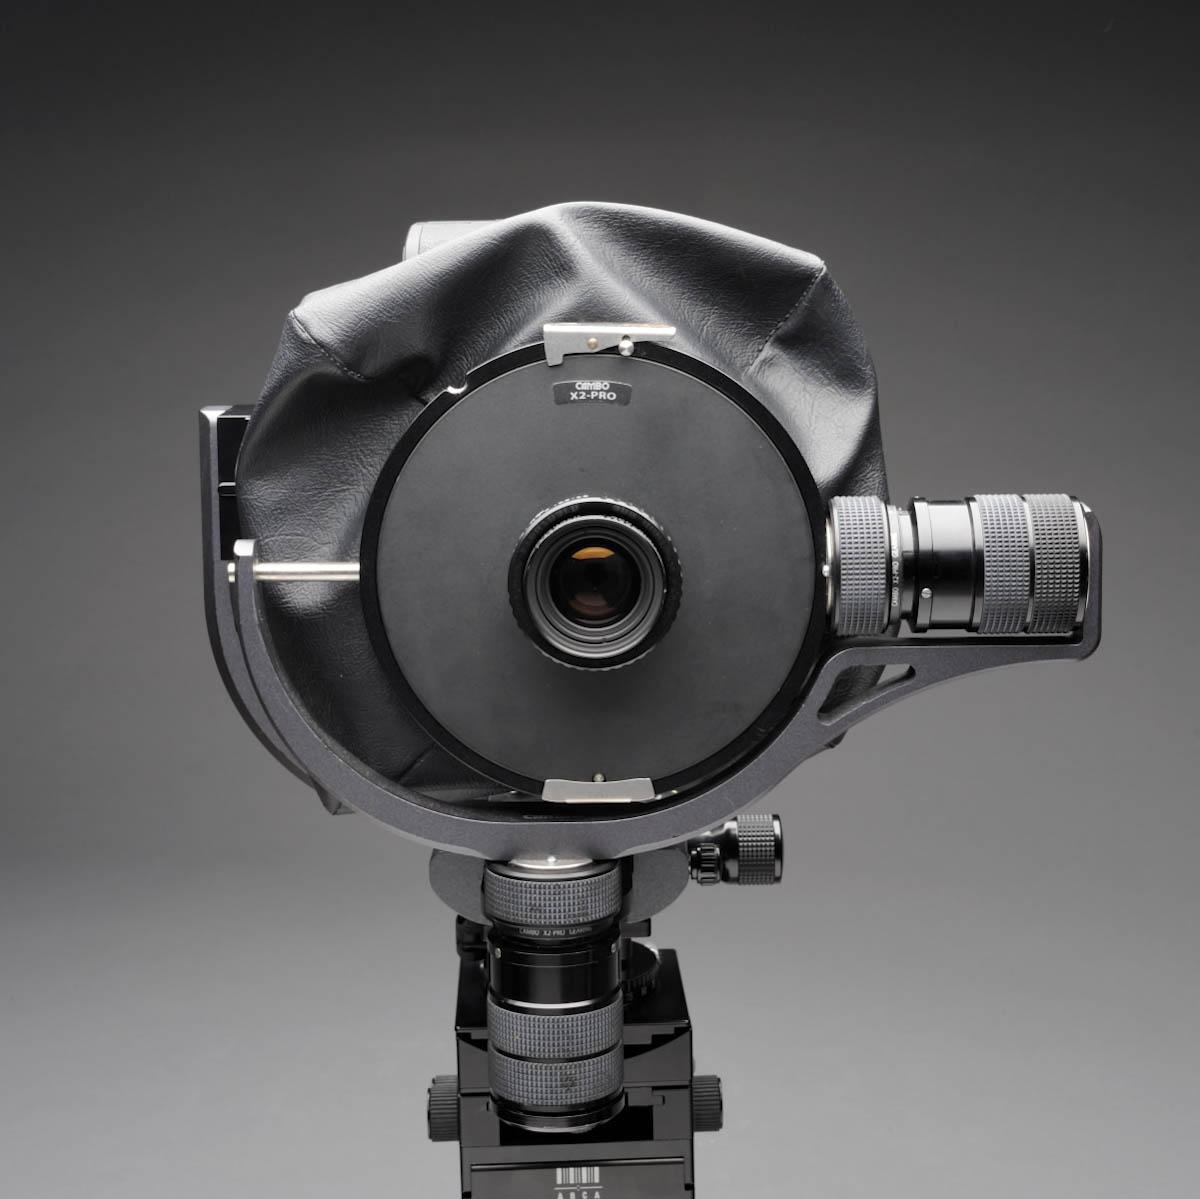 Nikon-D800-Cambo-X2-Pro-Schneider-Kreuznach-APO-90mm-f4.5-10